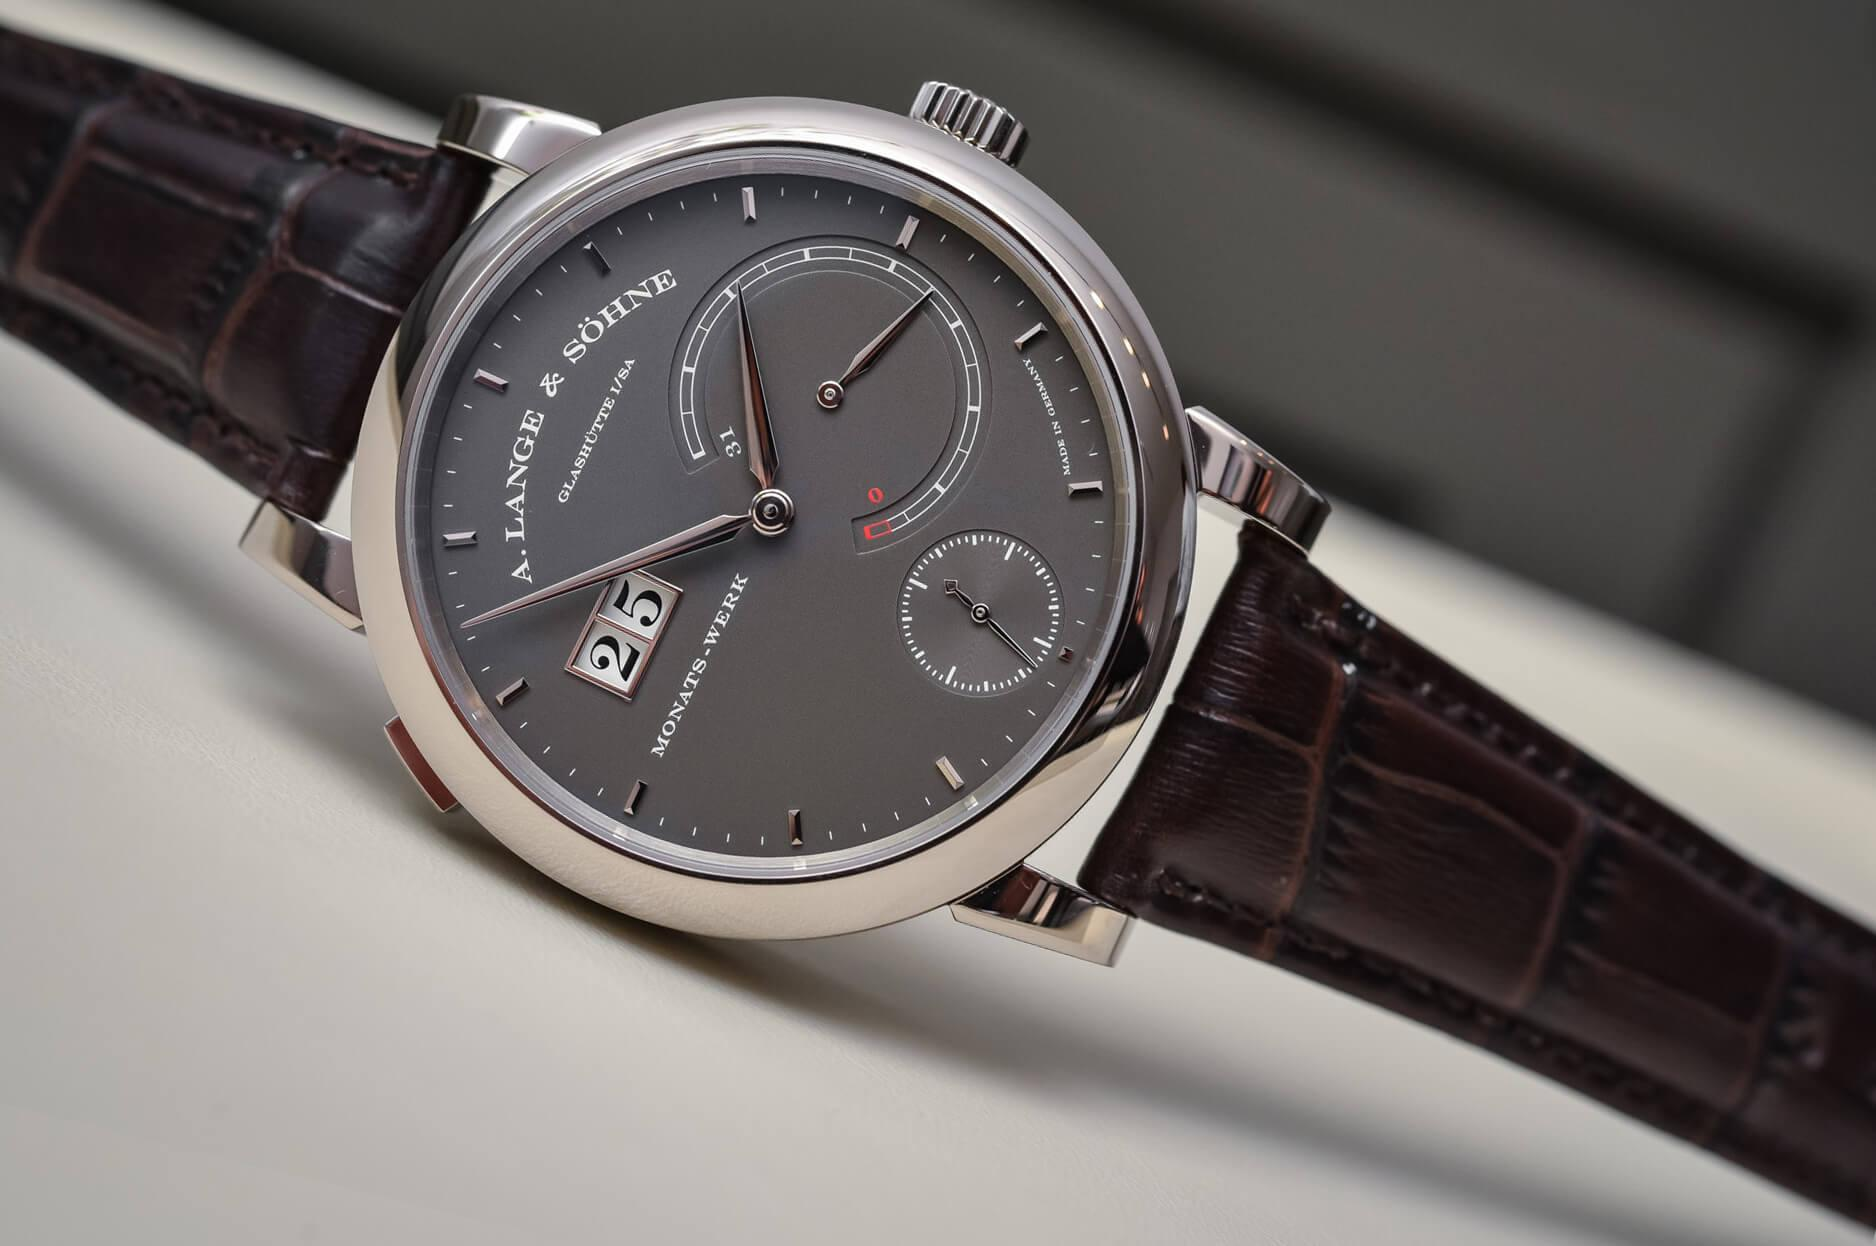 Часы на кожаном ремне A. Lange & Söhne